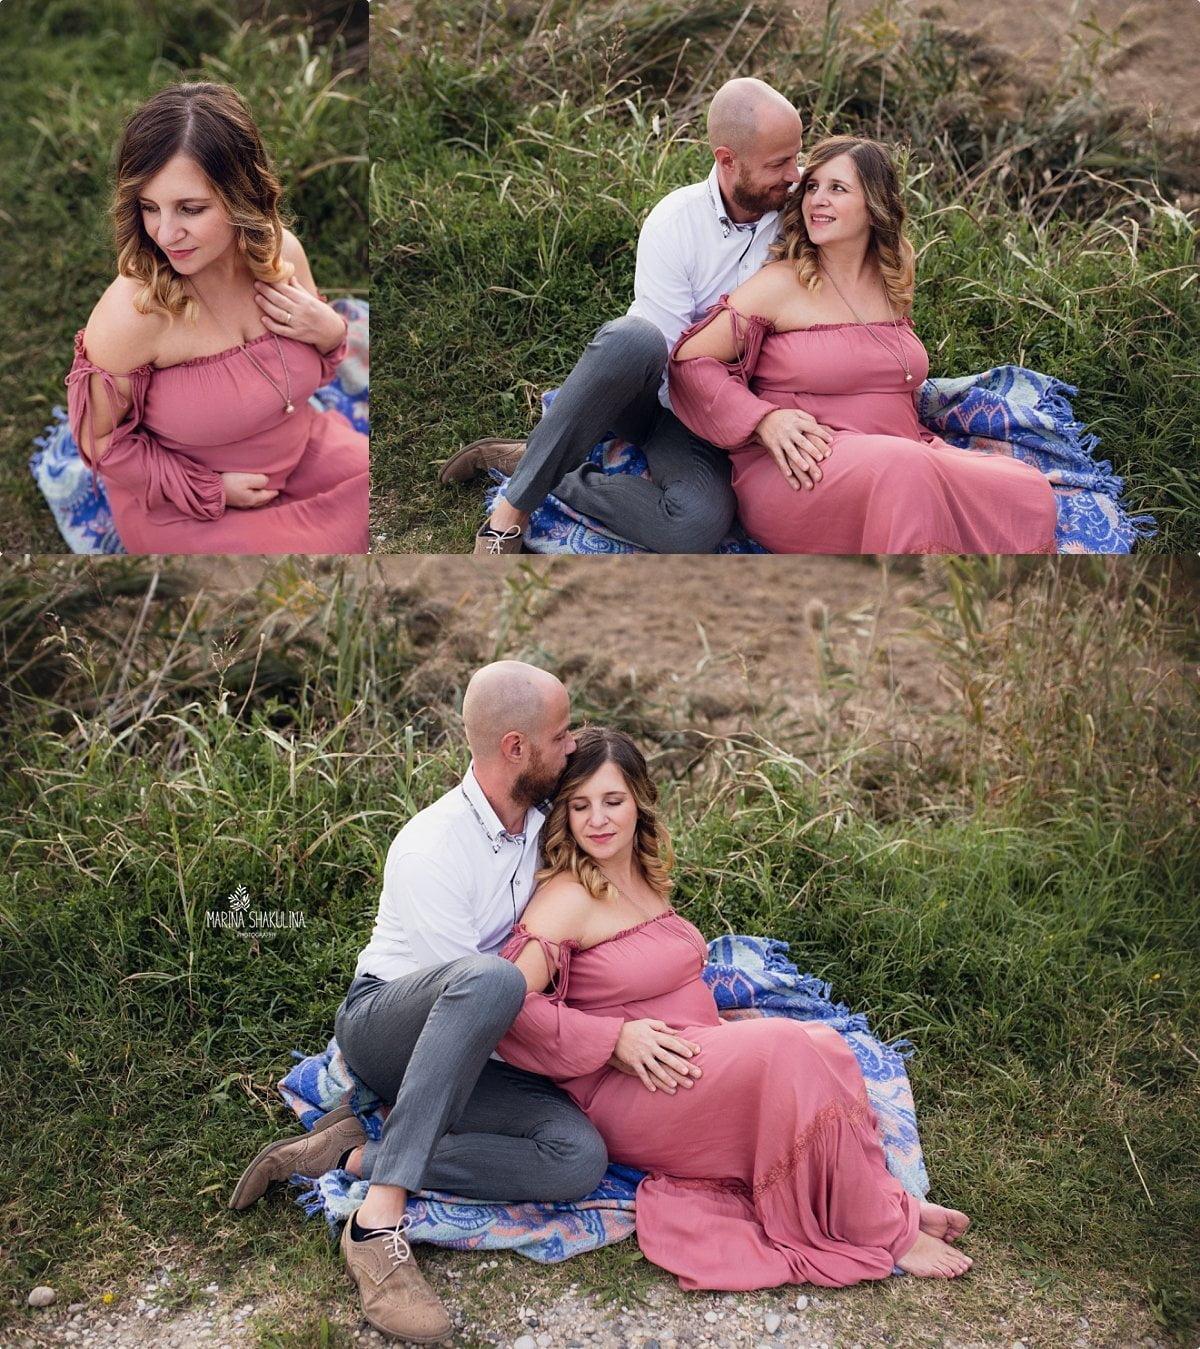 Fotografa Maternity - coppia seduta sul plaid